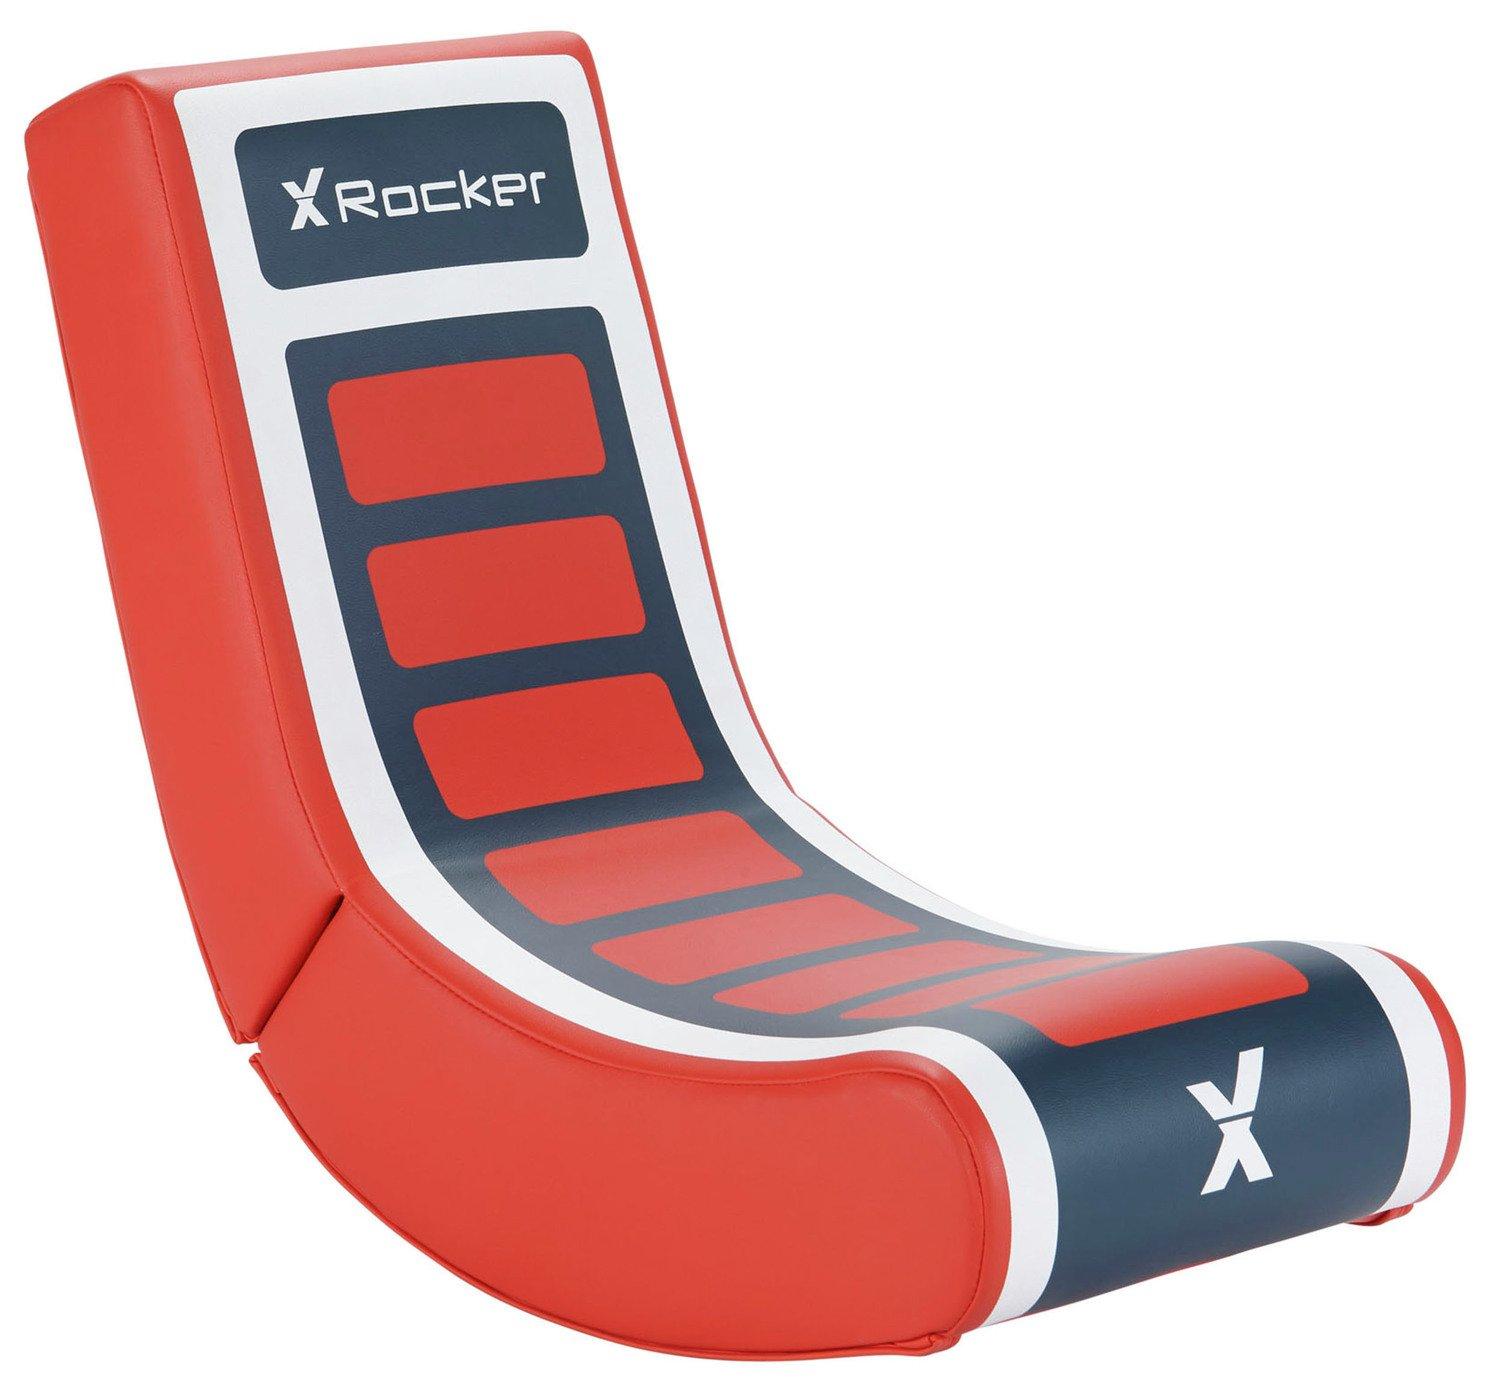 X-Rocker Video Rocker Junior Gaming Chair - Red